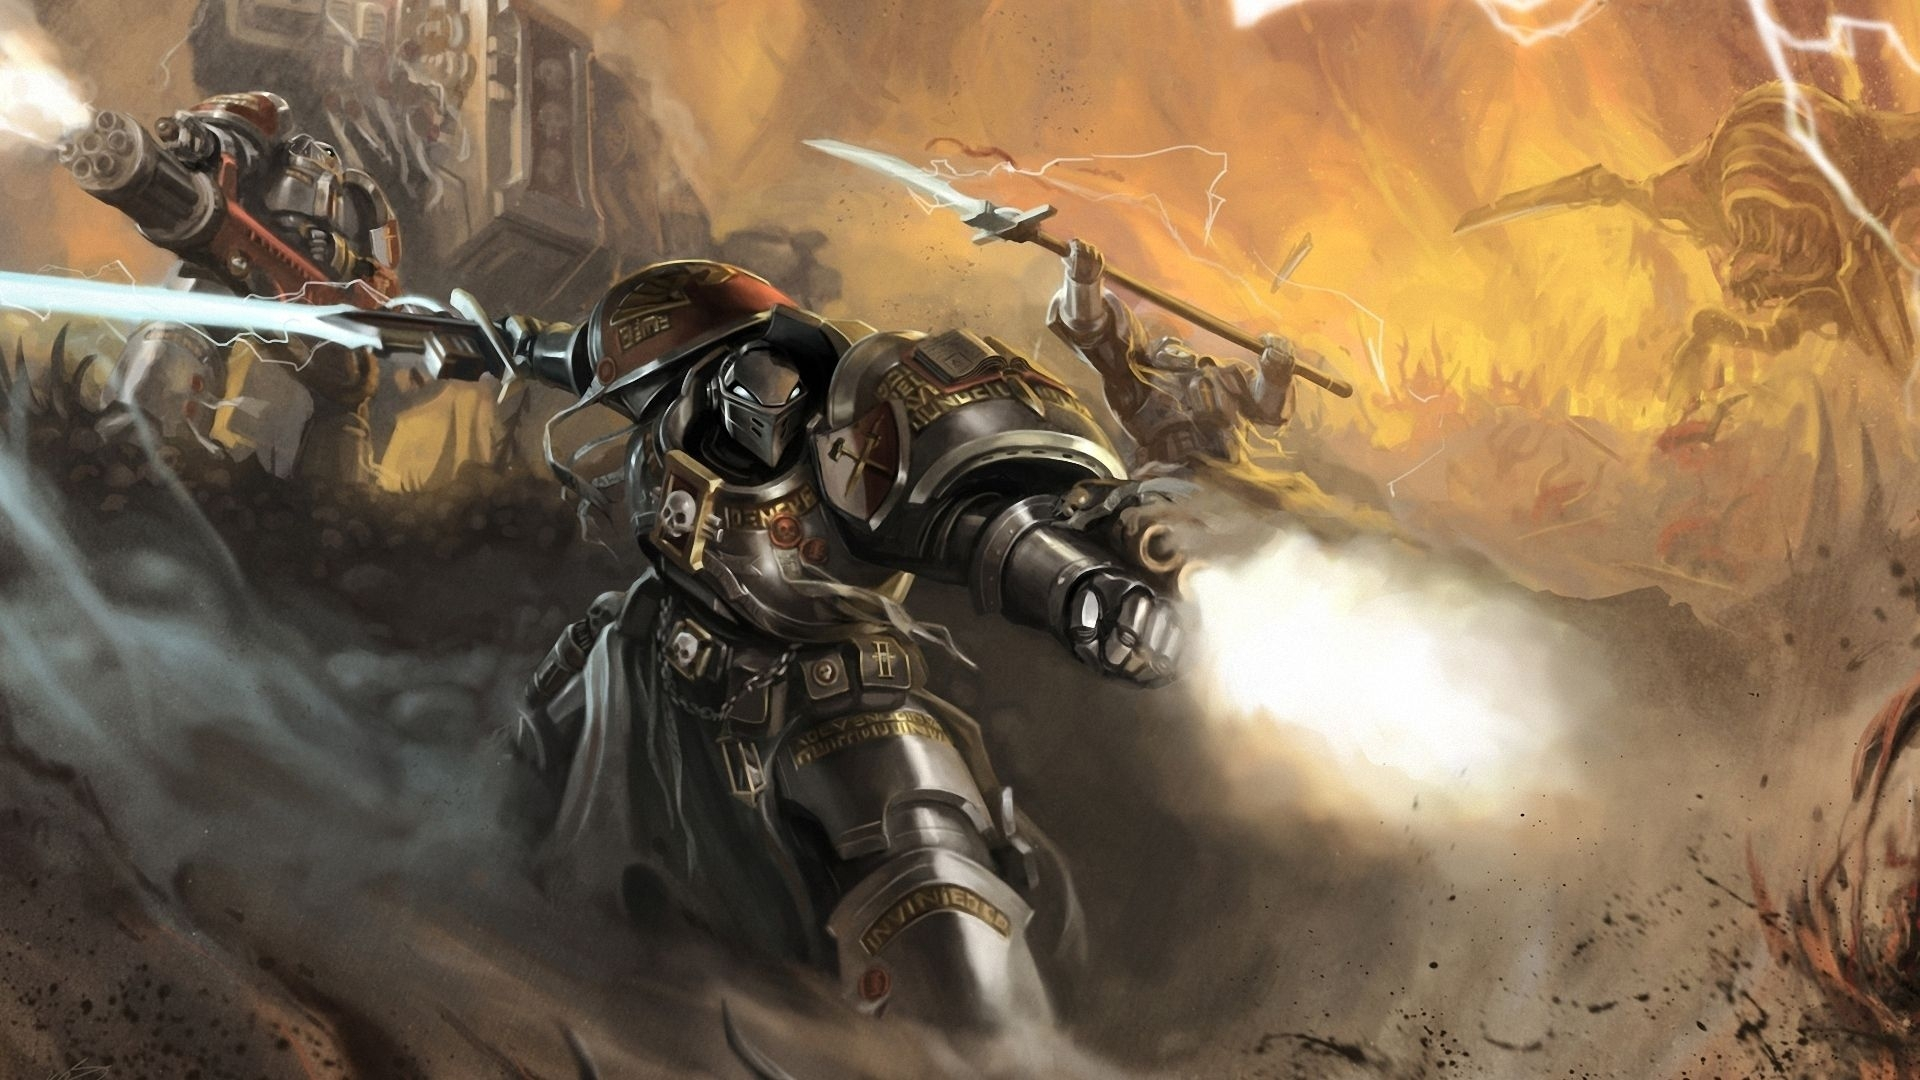 warhammer k wallpapers wallpaper | w40k | pinterest